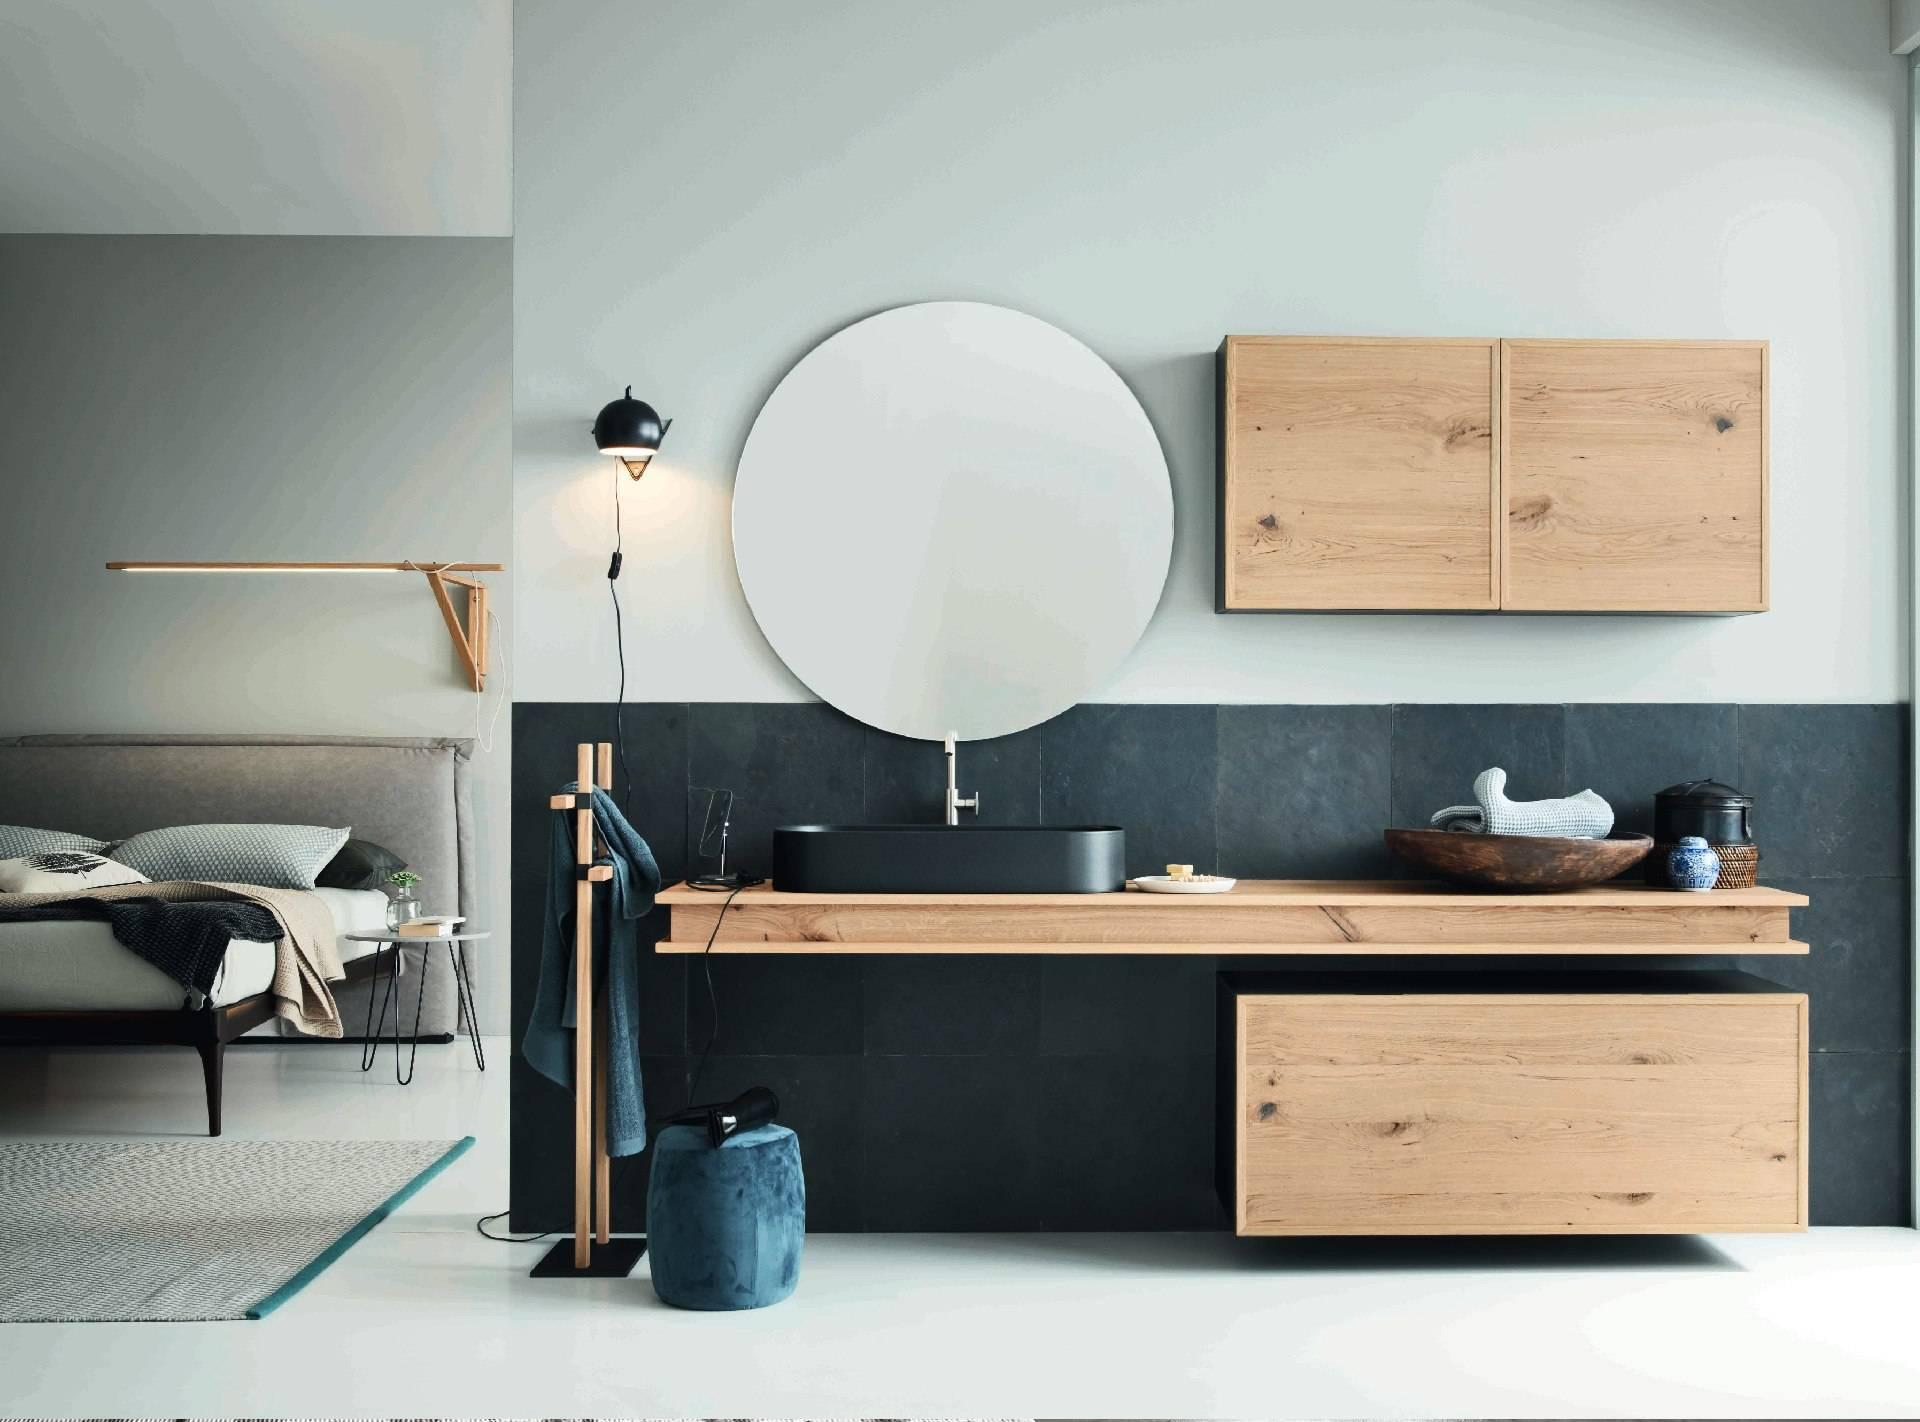 meuble de salle de bain en chêne vieilli avec crédence finition granite